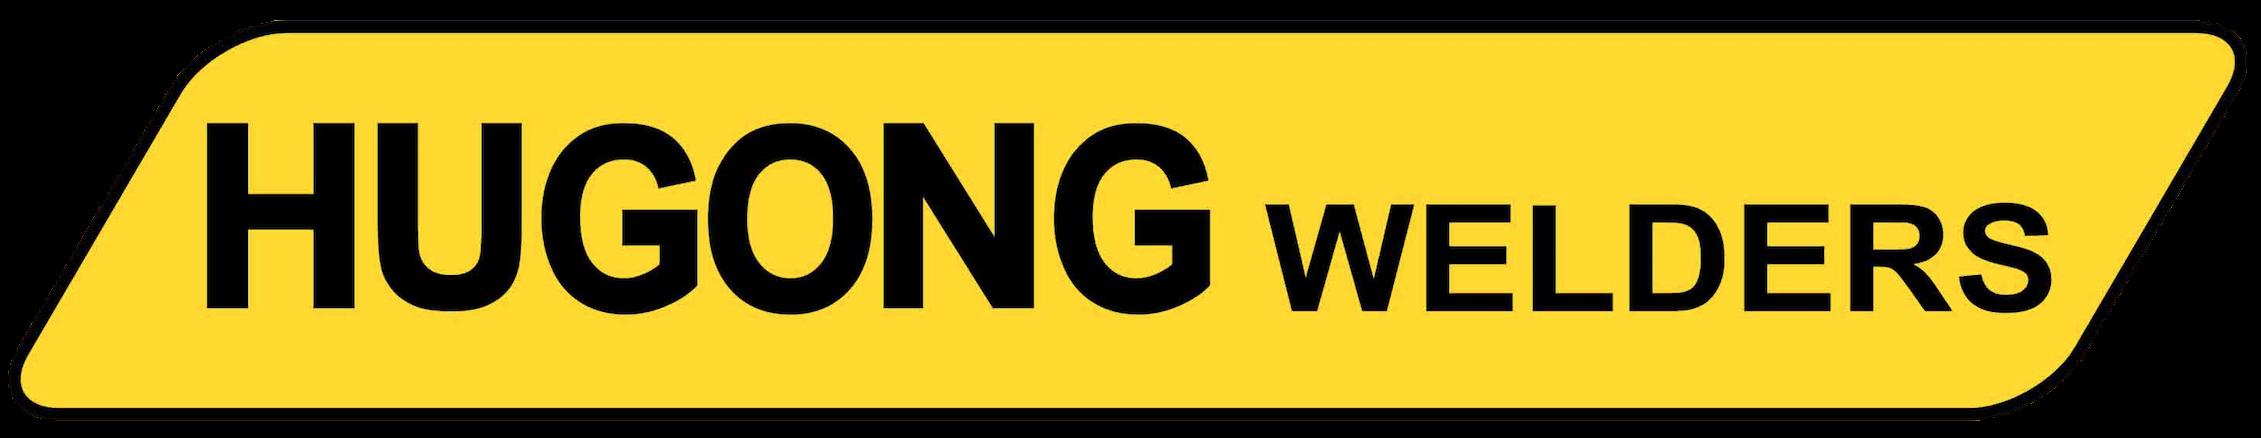 hugong-logo-10.png